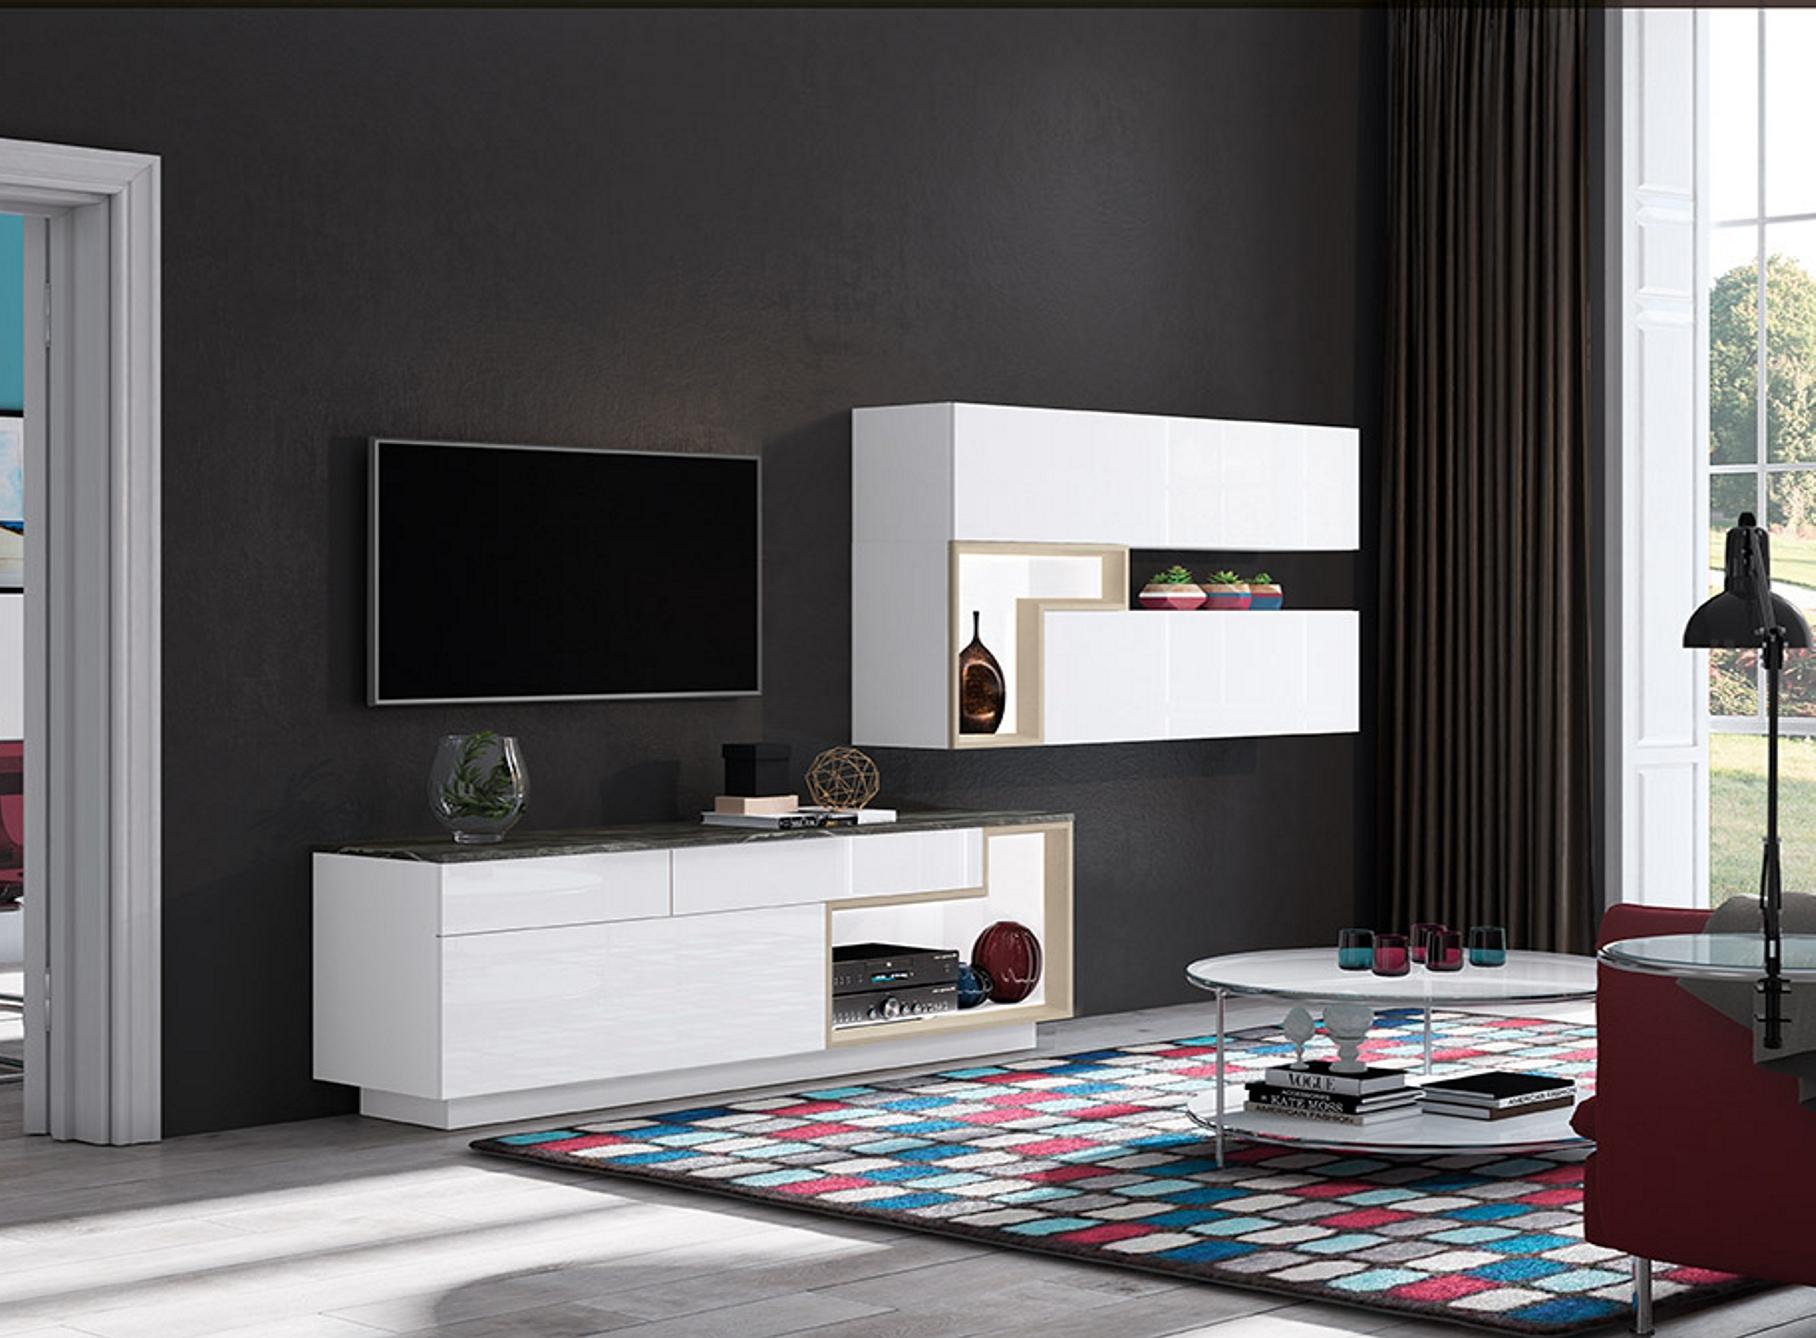 salon-moderno-Zion-3.0-muebles-paco-caballero-0907-5c8d32e166539